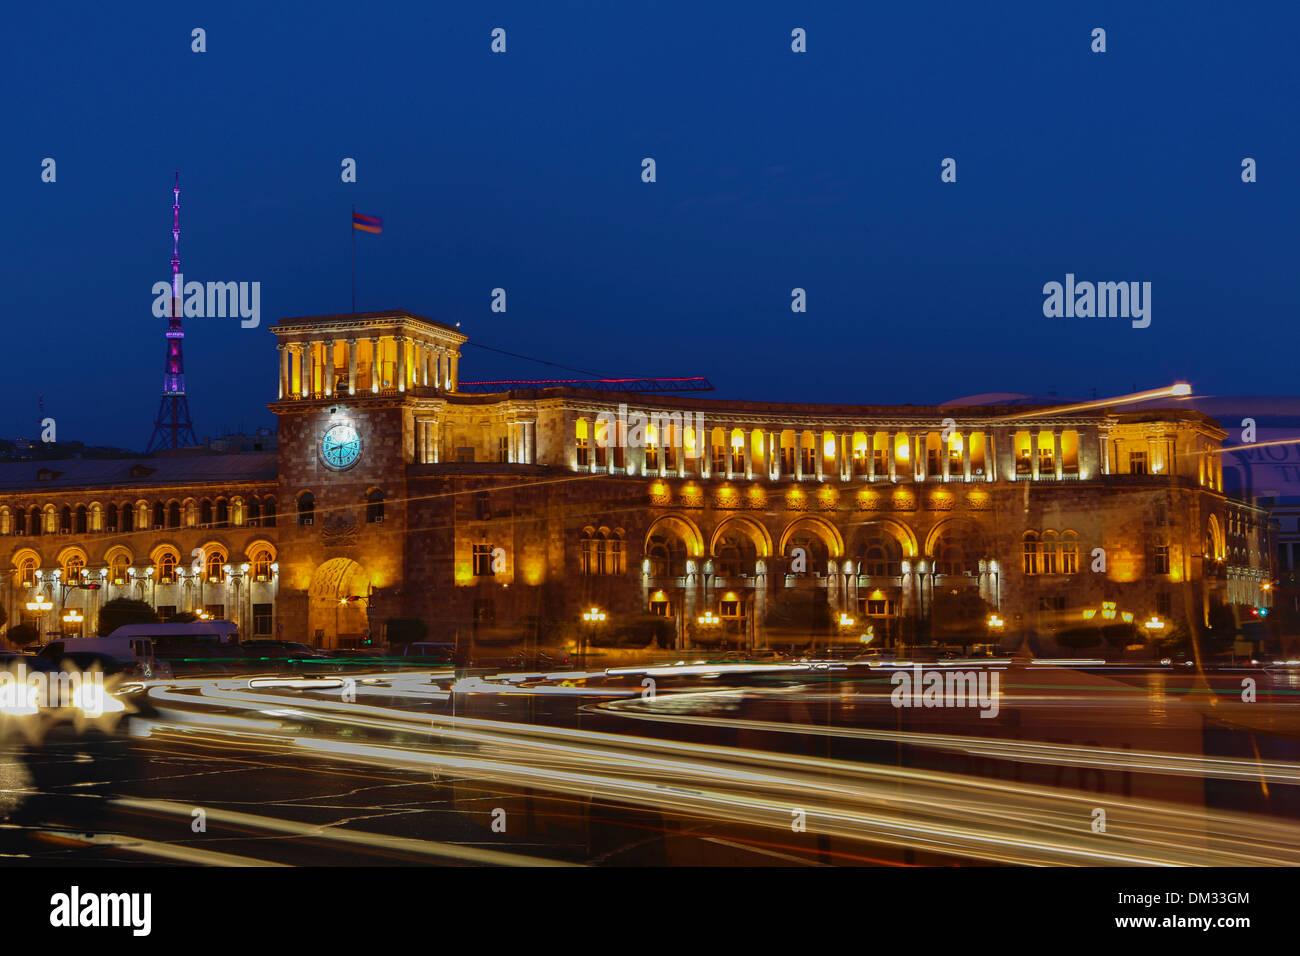 Armenia South Caucasus Caucasus Eurasia building History Clock Republic Yerevan architecture city downtown famous landmark - Stock Image